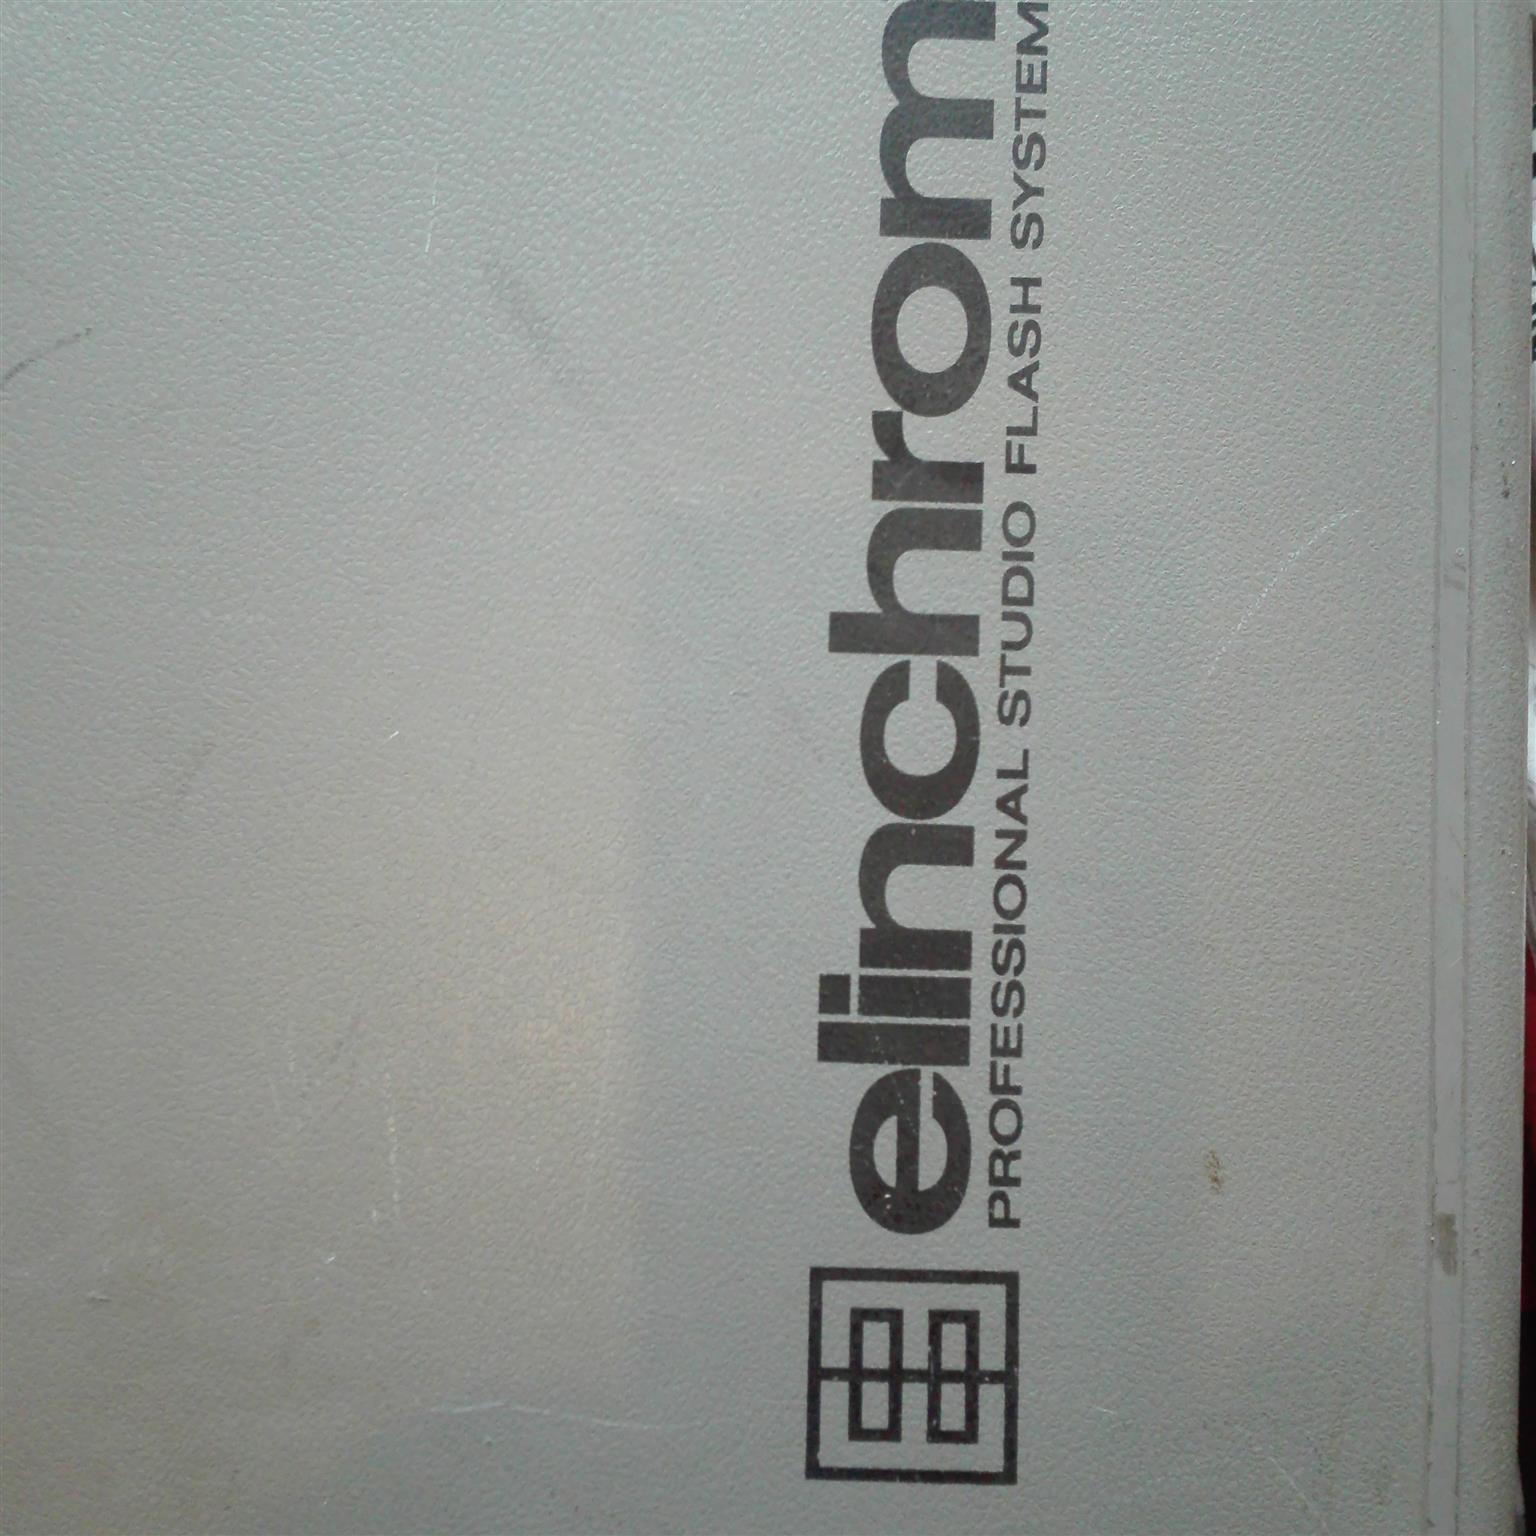 ELINCHROM PROFESSIONAL STUDIO FLASH SYSTEM